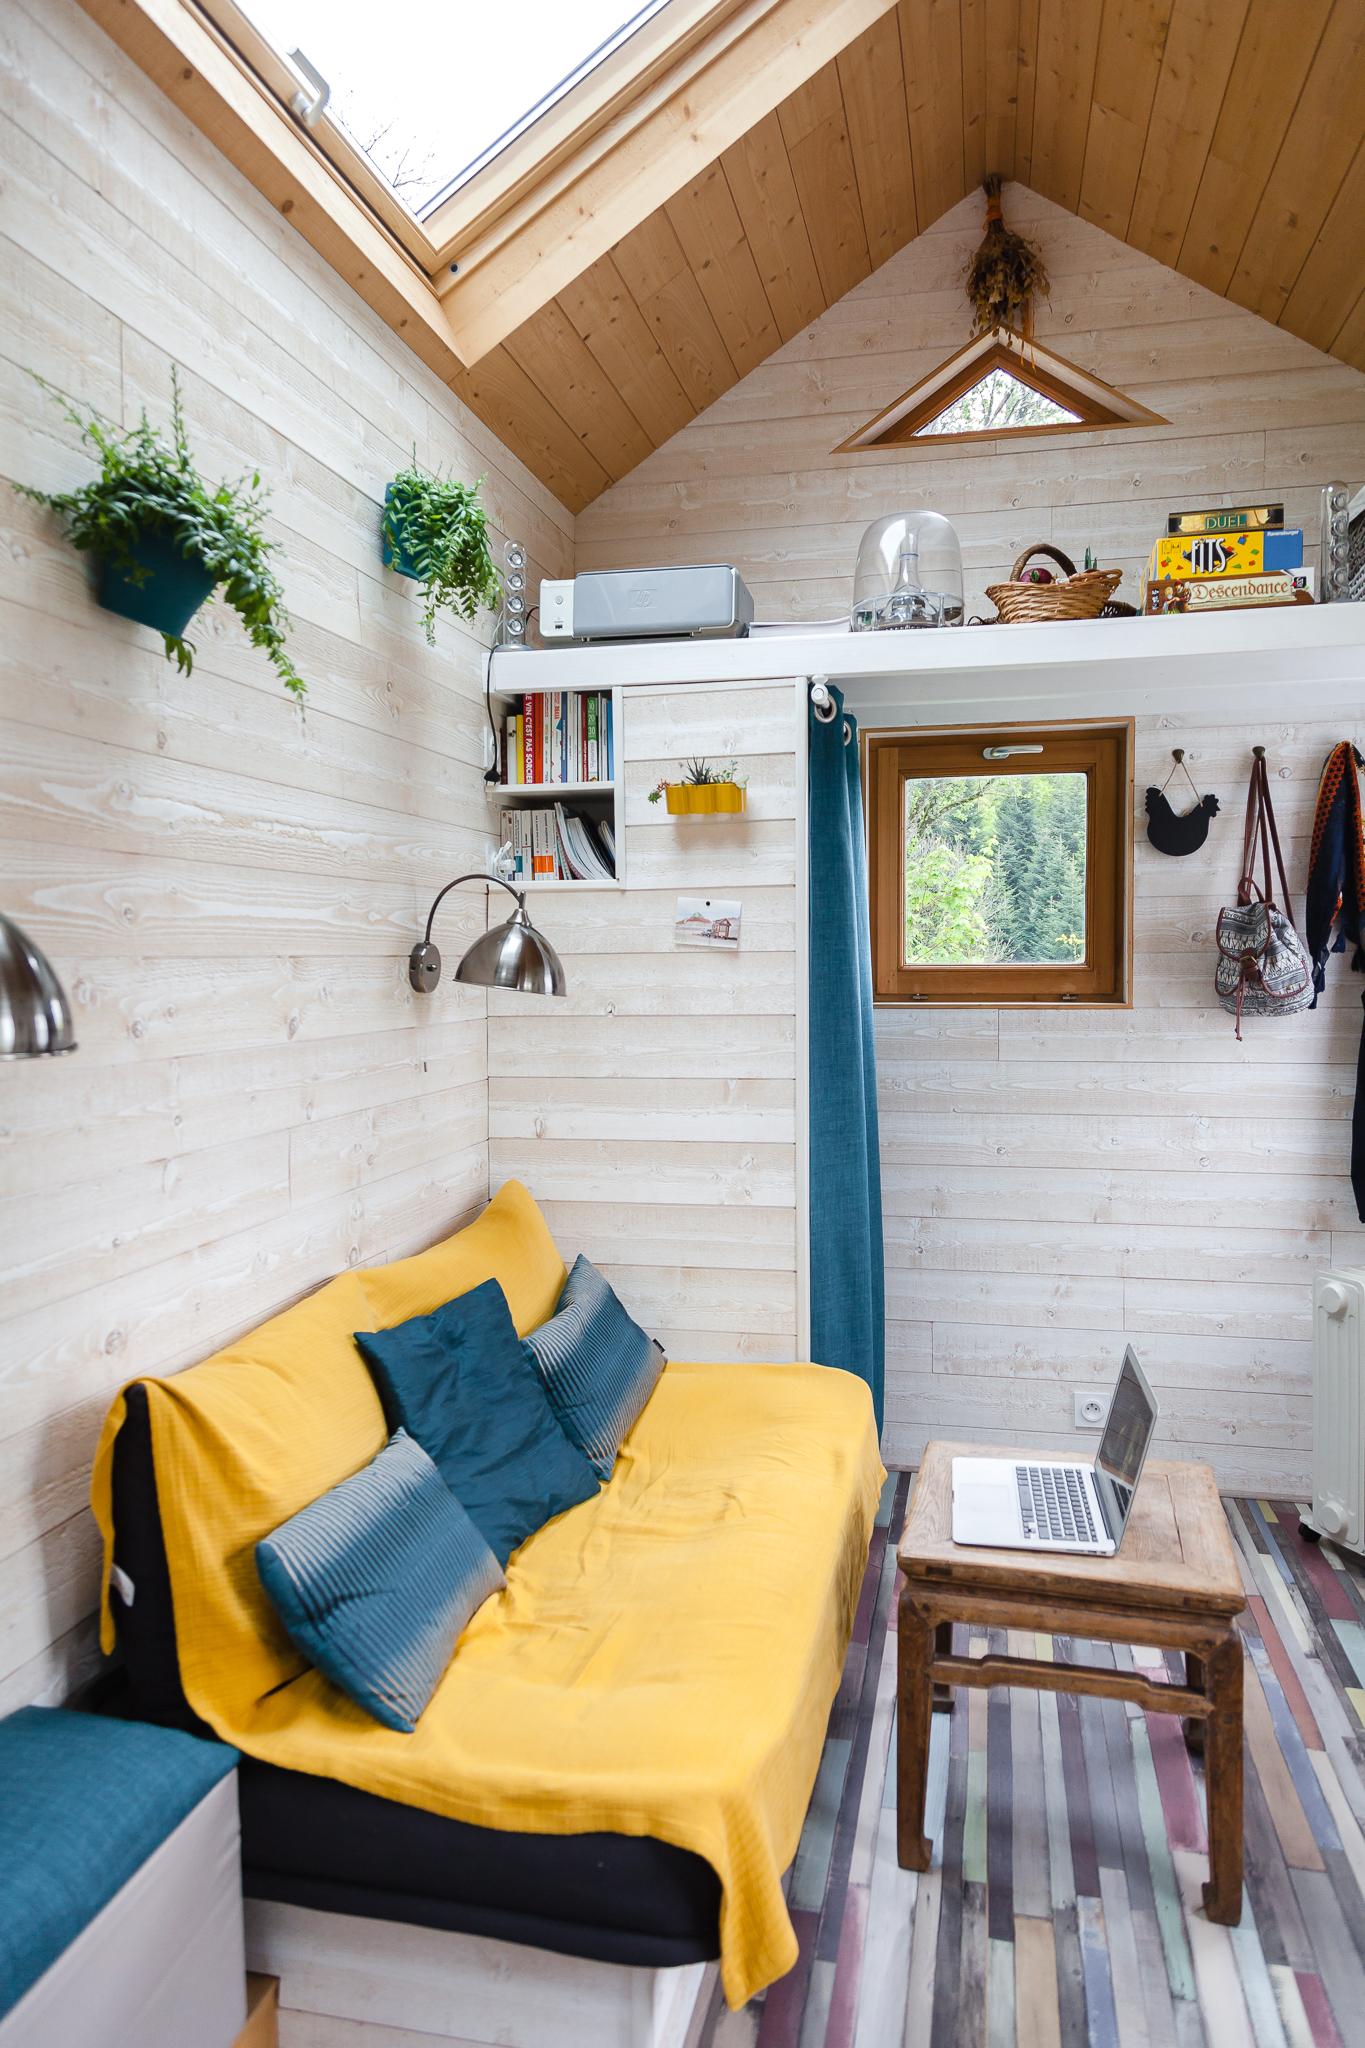 tiny house vendre en savoie collectif tiny house. Black Bedroom Furniture Sets. Home Design Ideas